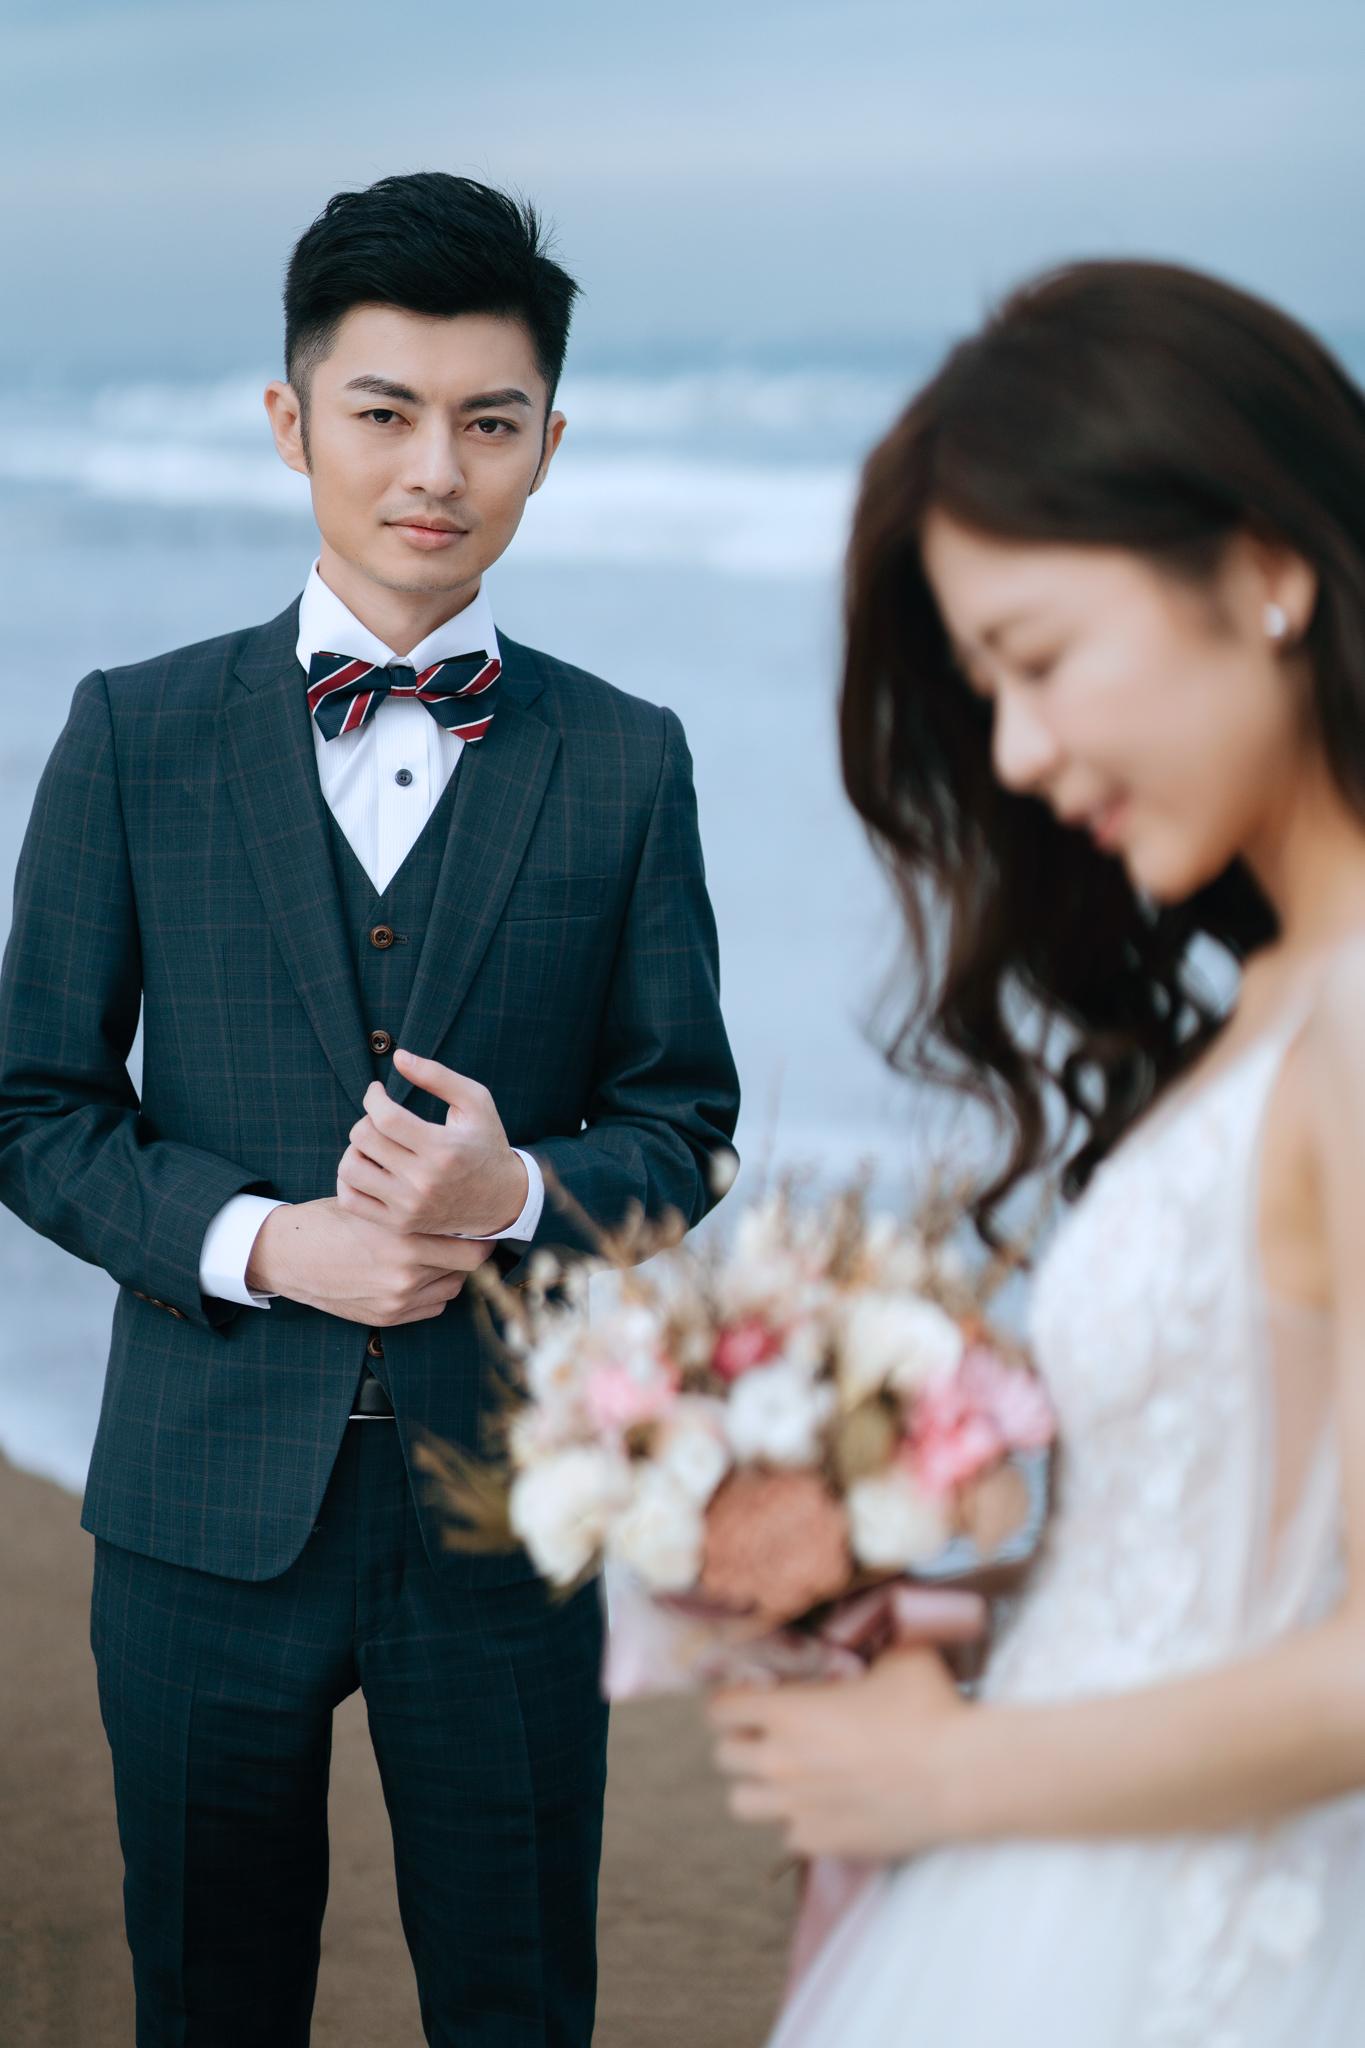 Donfer, EASTERN WEDDING, 台北婚紗, 藝術婚紗, 芒草, 森林系